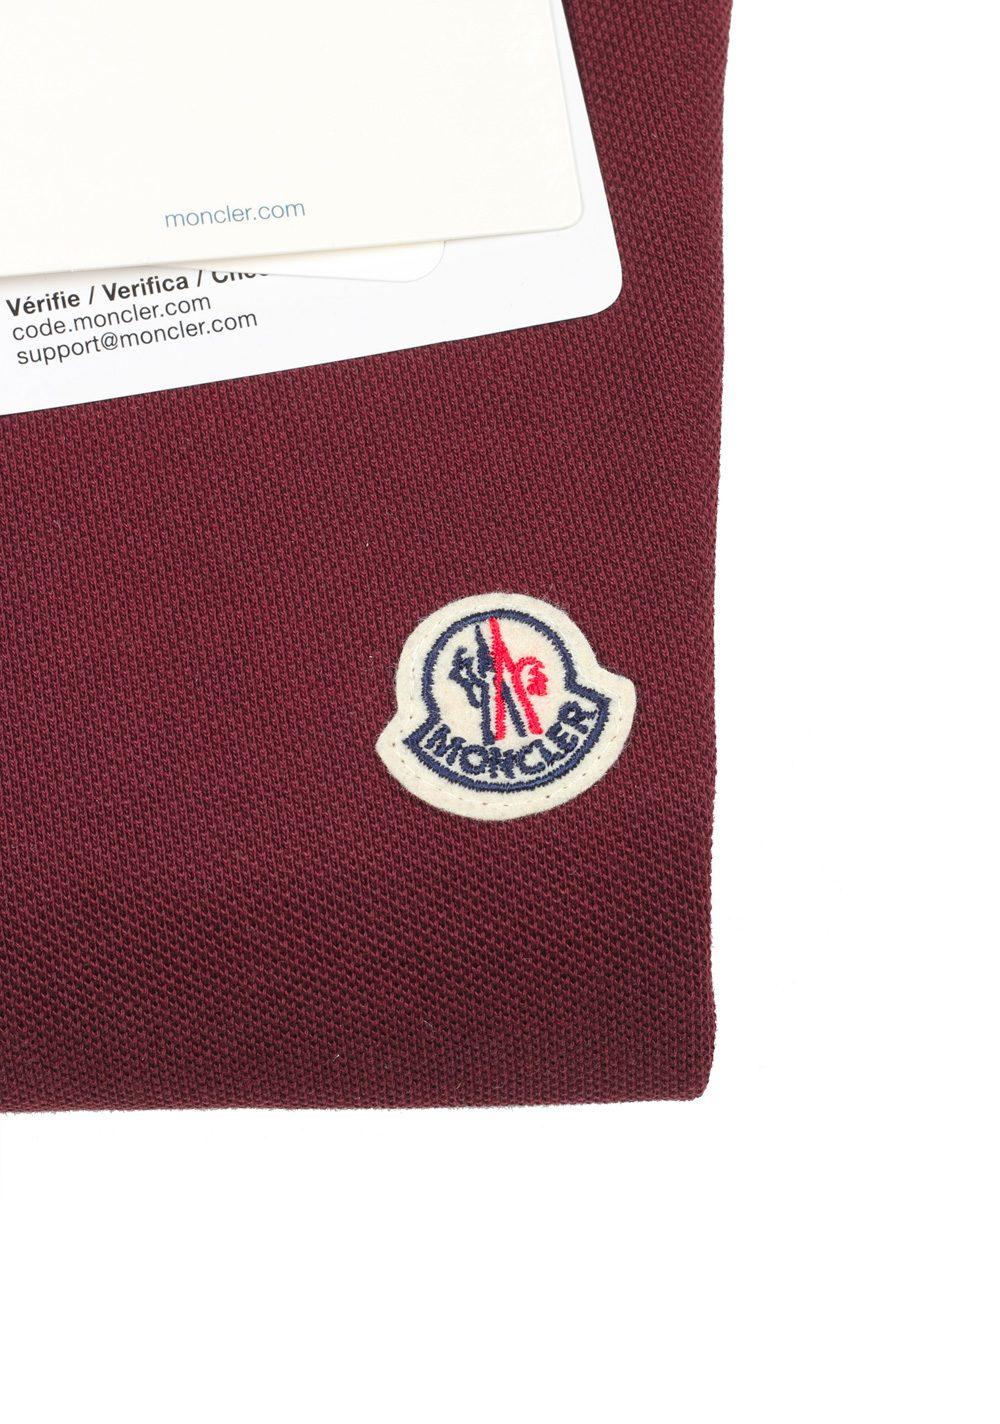 e16412d85ac8 Moncler Red Long Sleeve Polo Shirt Size M   38R U.S.